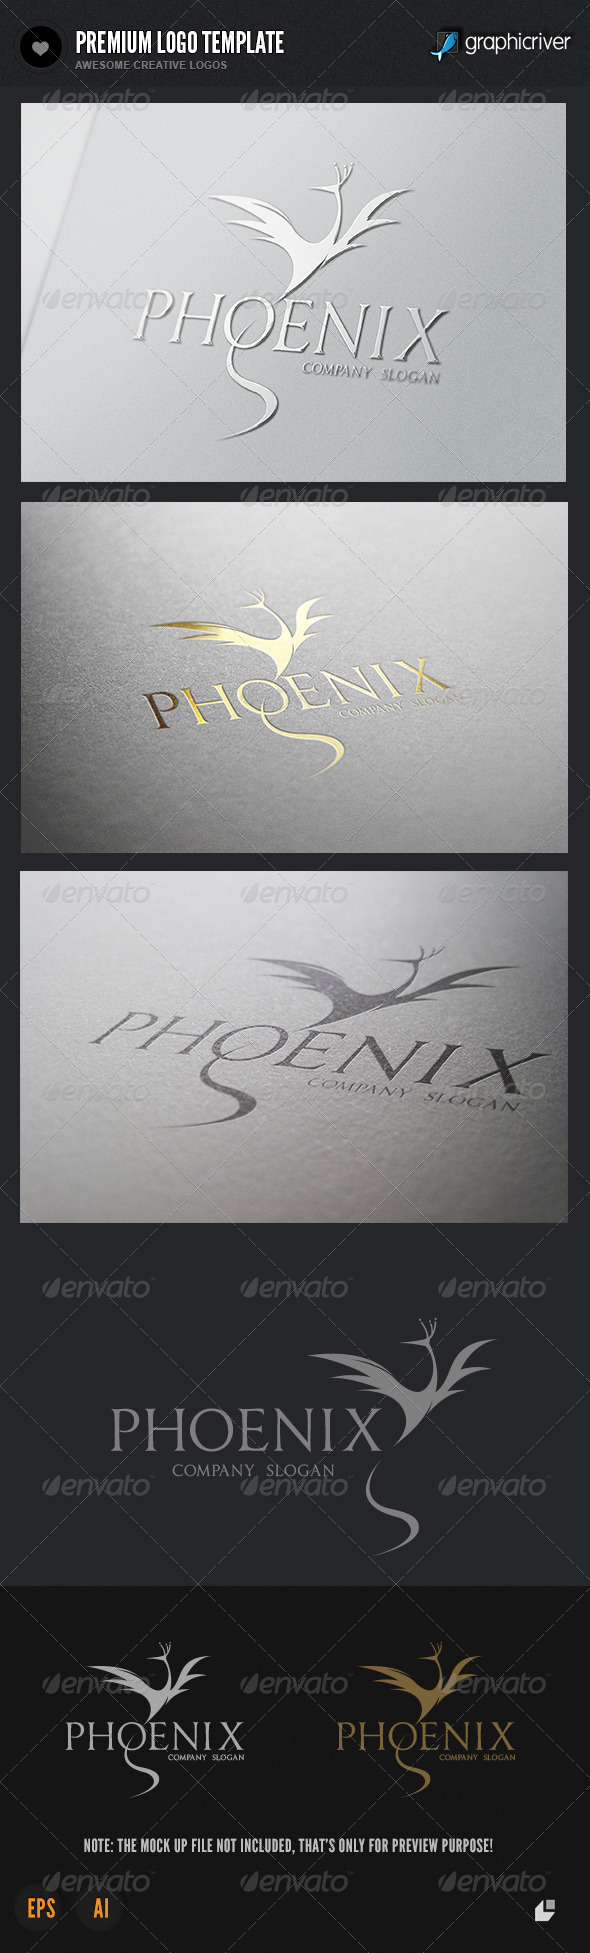 GraphicRiver Pheoenix Brand Logo 4657362